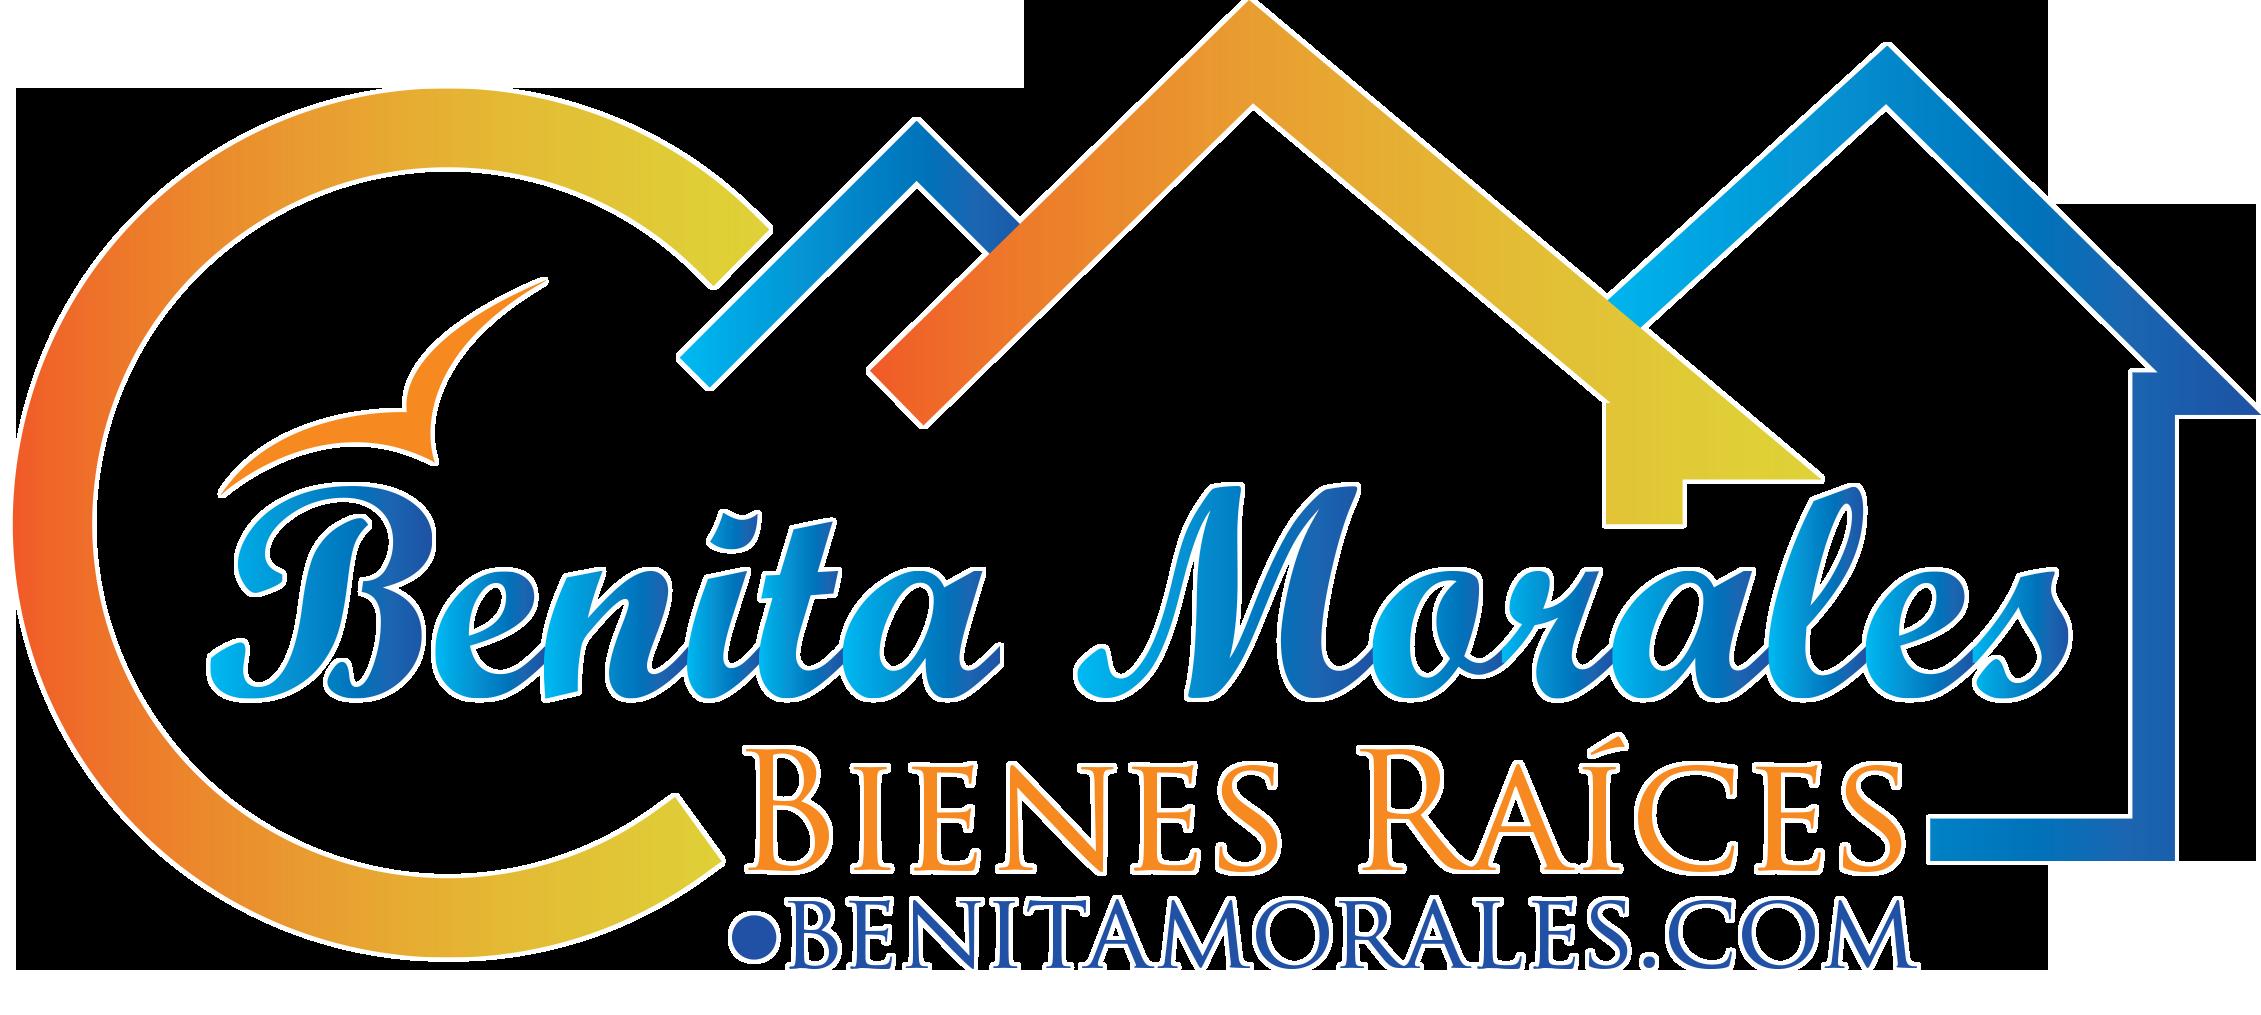 BENITA-MORALES-LETRA-AZUL.png